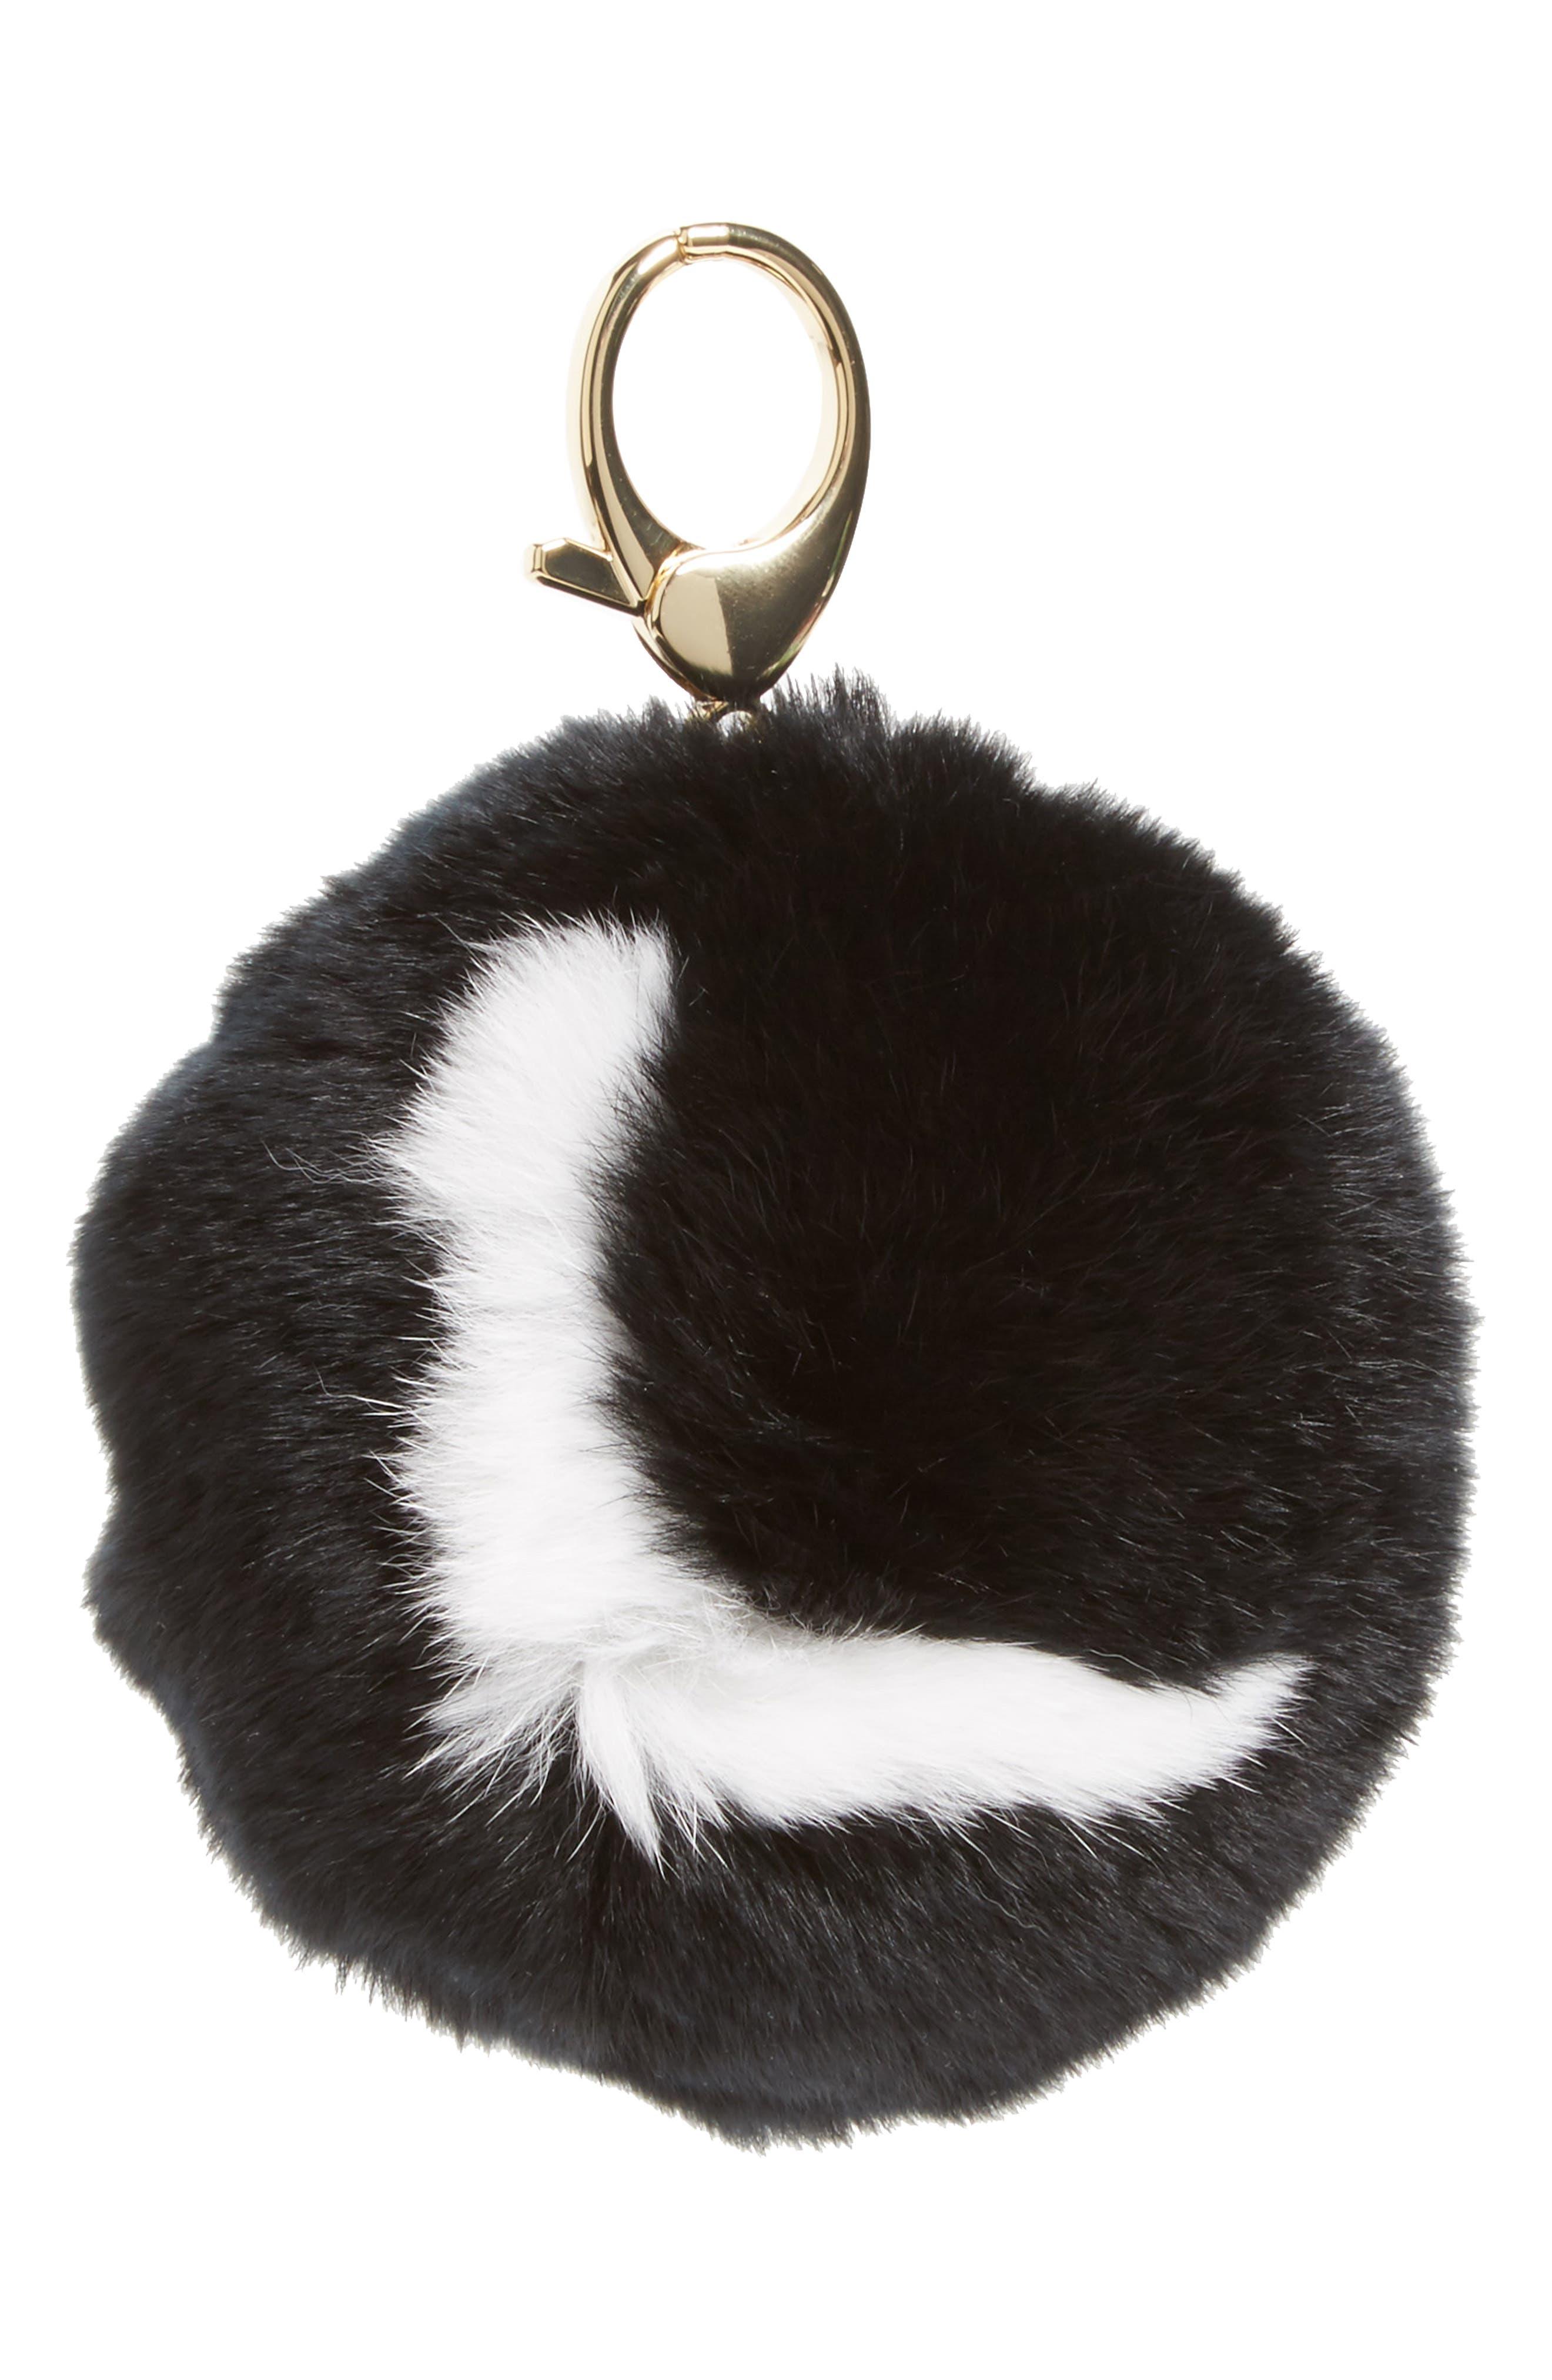 REBECCA MINKOFF Genuine Rabbit Fur Initial Pom Bag Charm, Main, color, 001